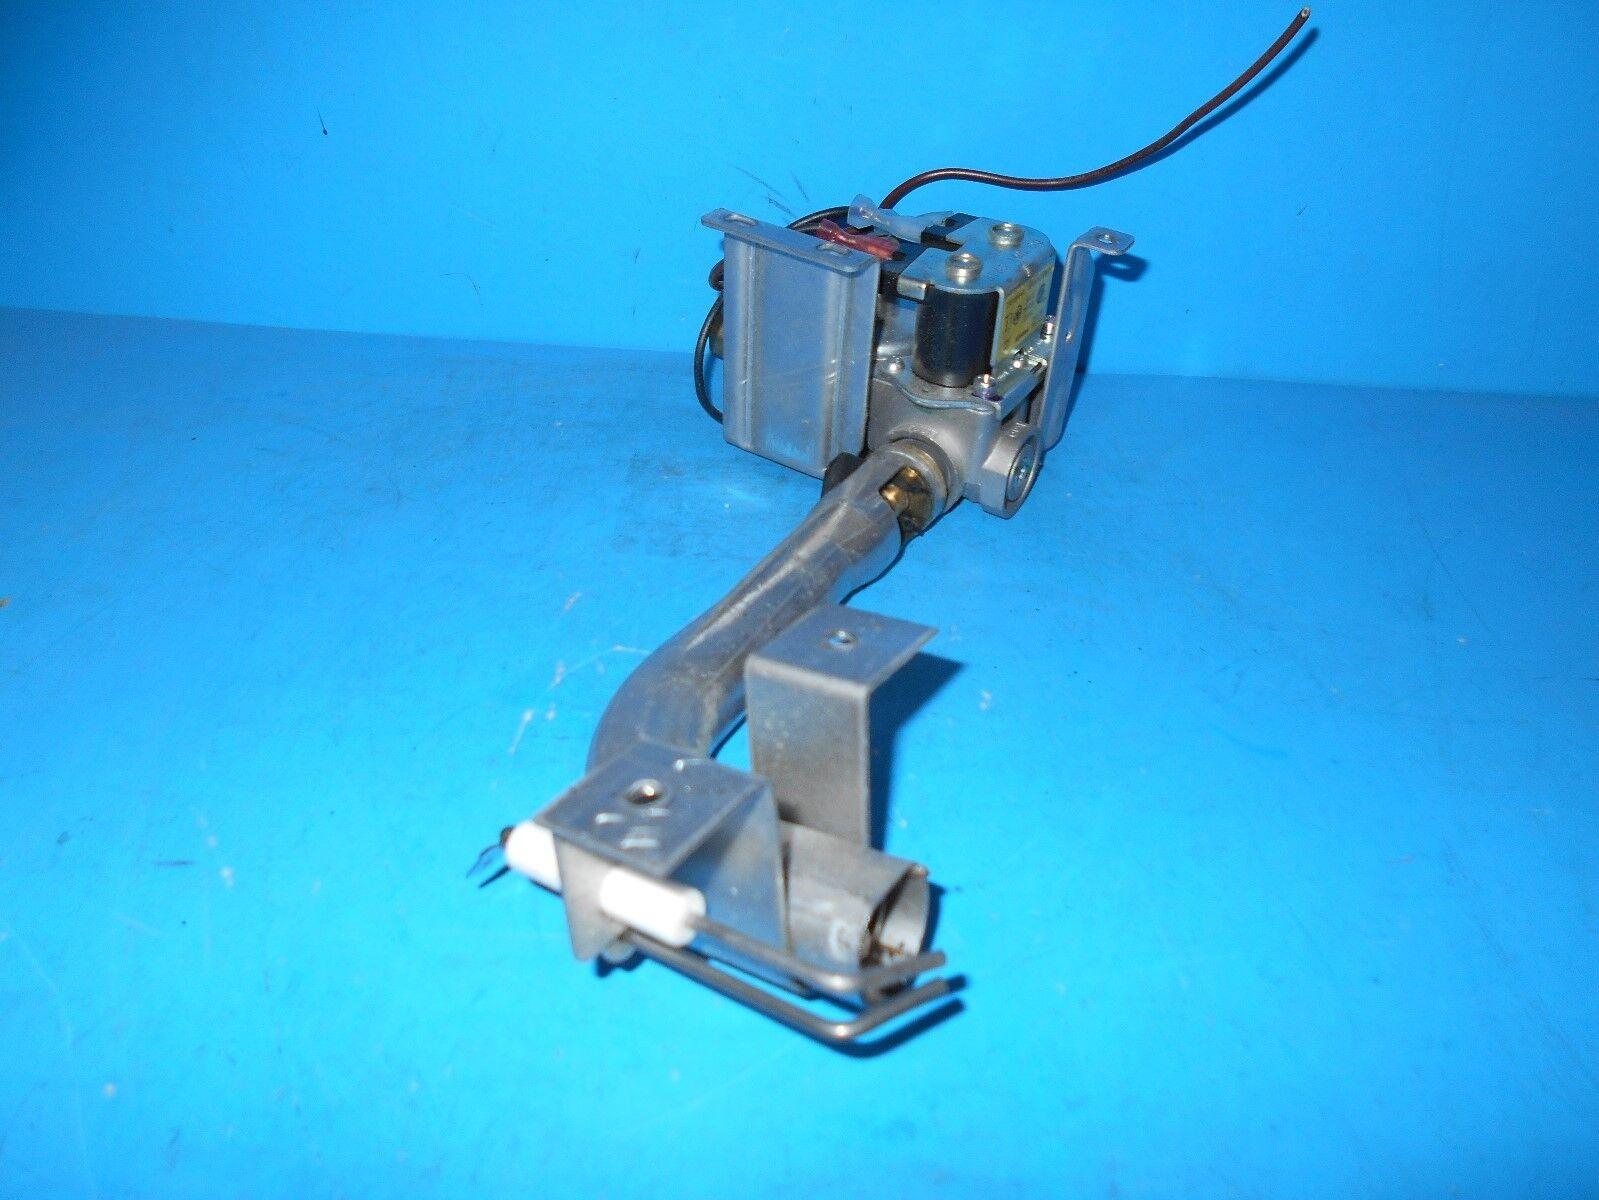 Suburban 161122 12 VDC Gas Valve Furnace Parts Camper Trailer RV | eBay